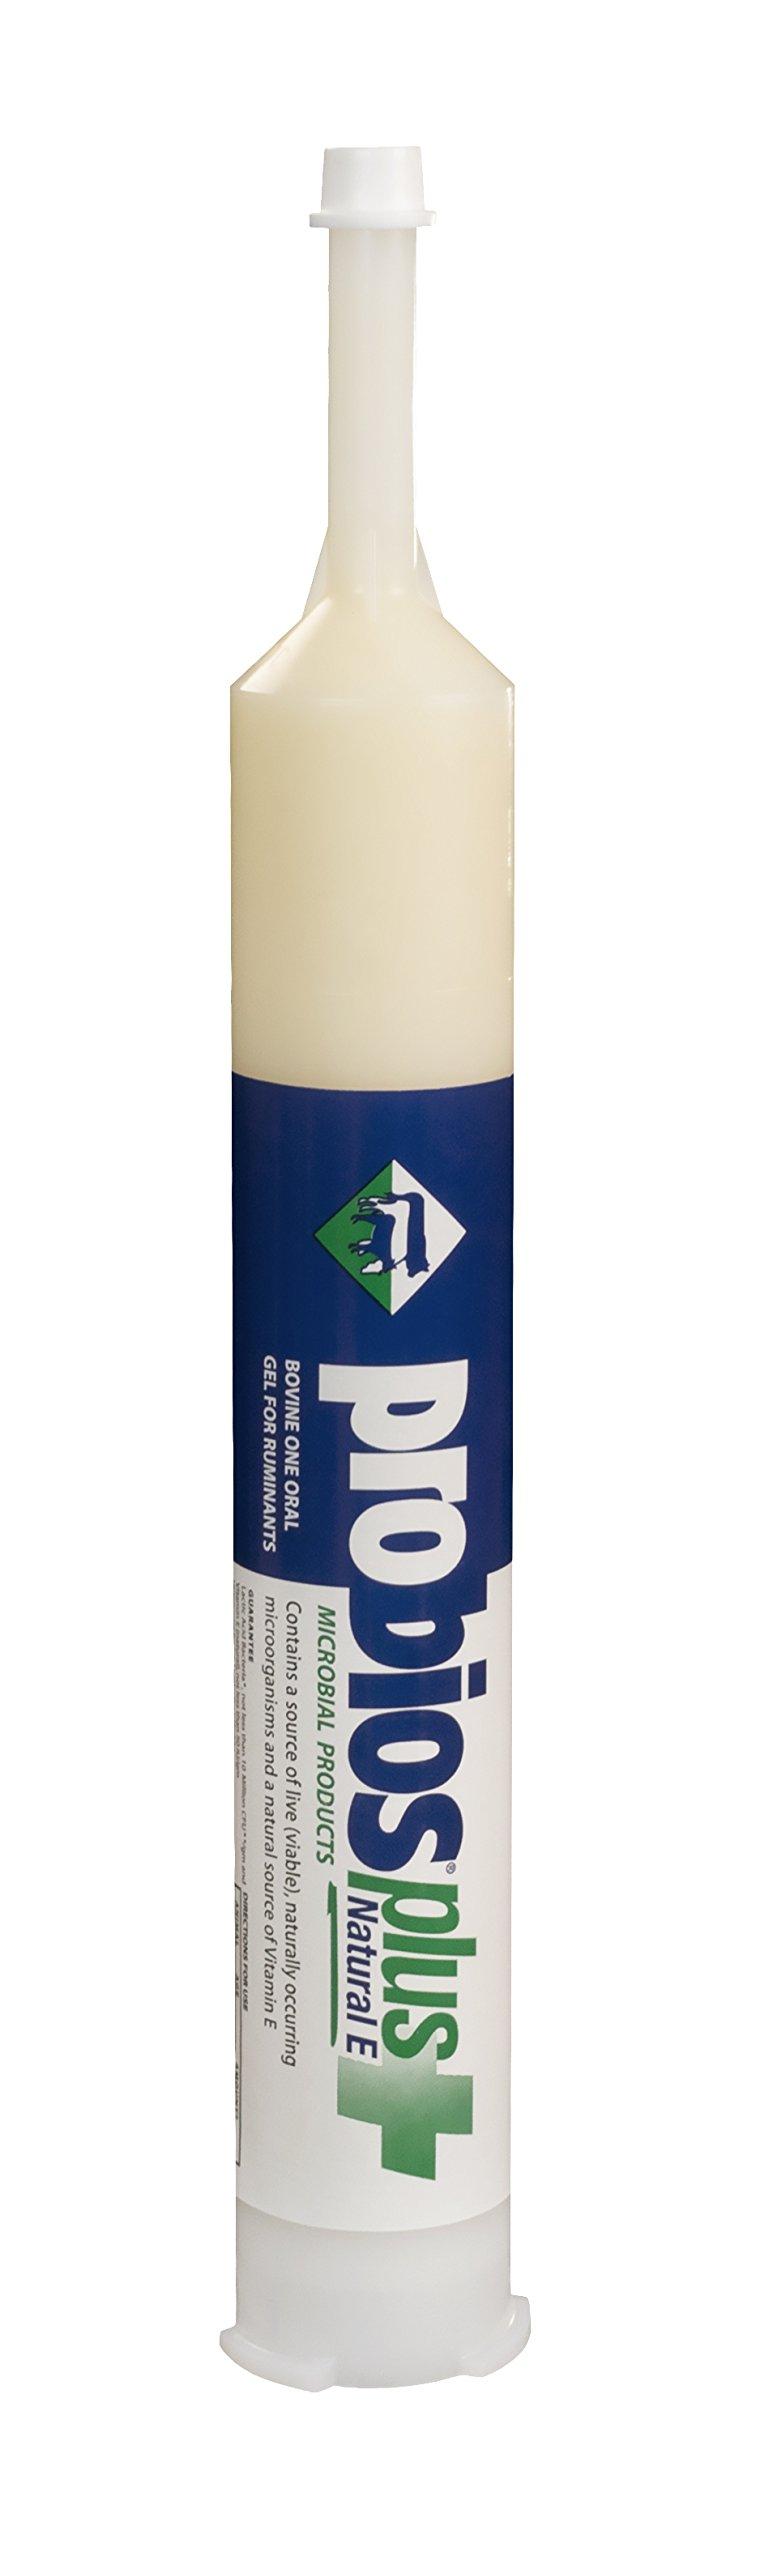 Probios Bovine One Oral Gel for Ruminants Plus Natural-E Tube, 300cc